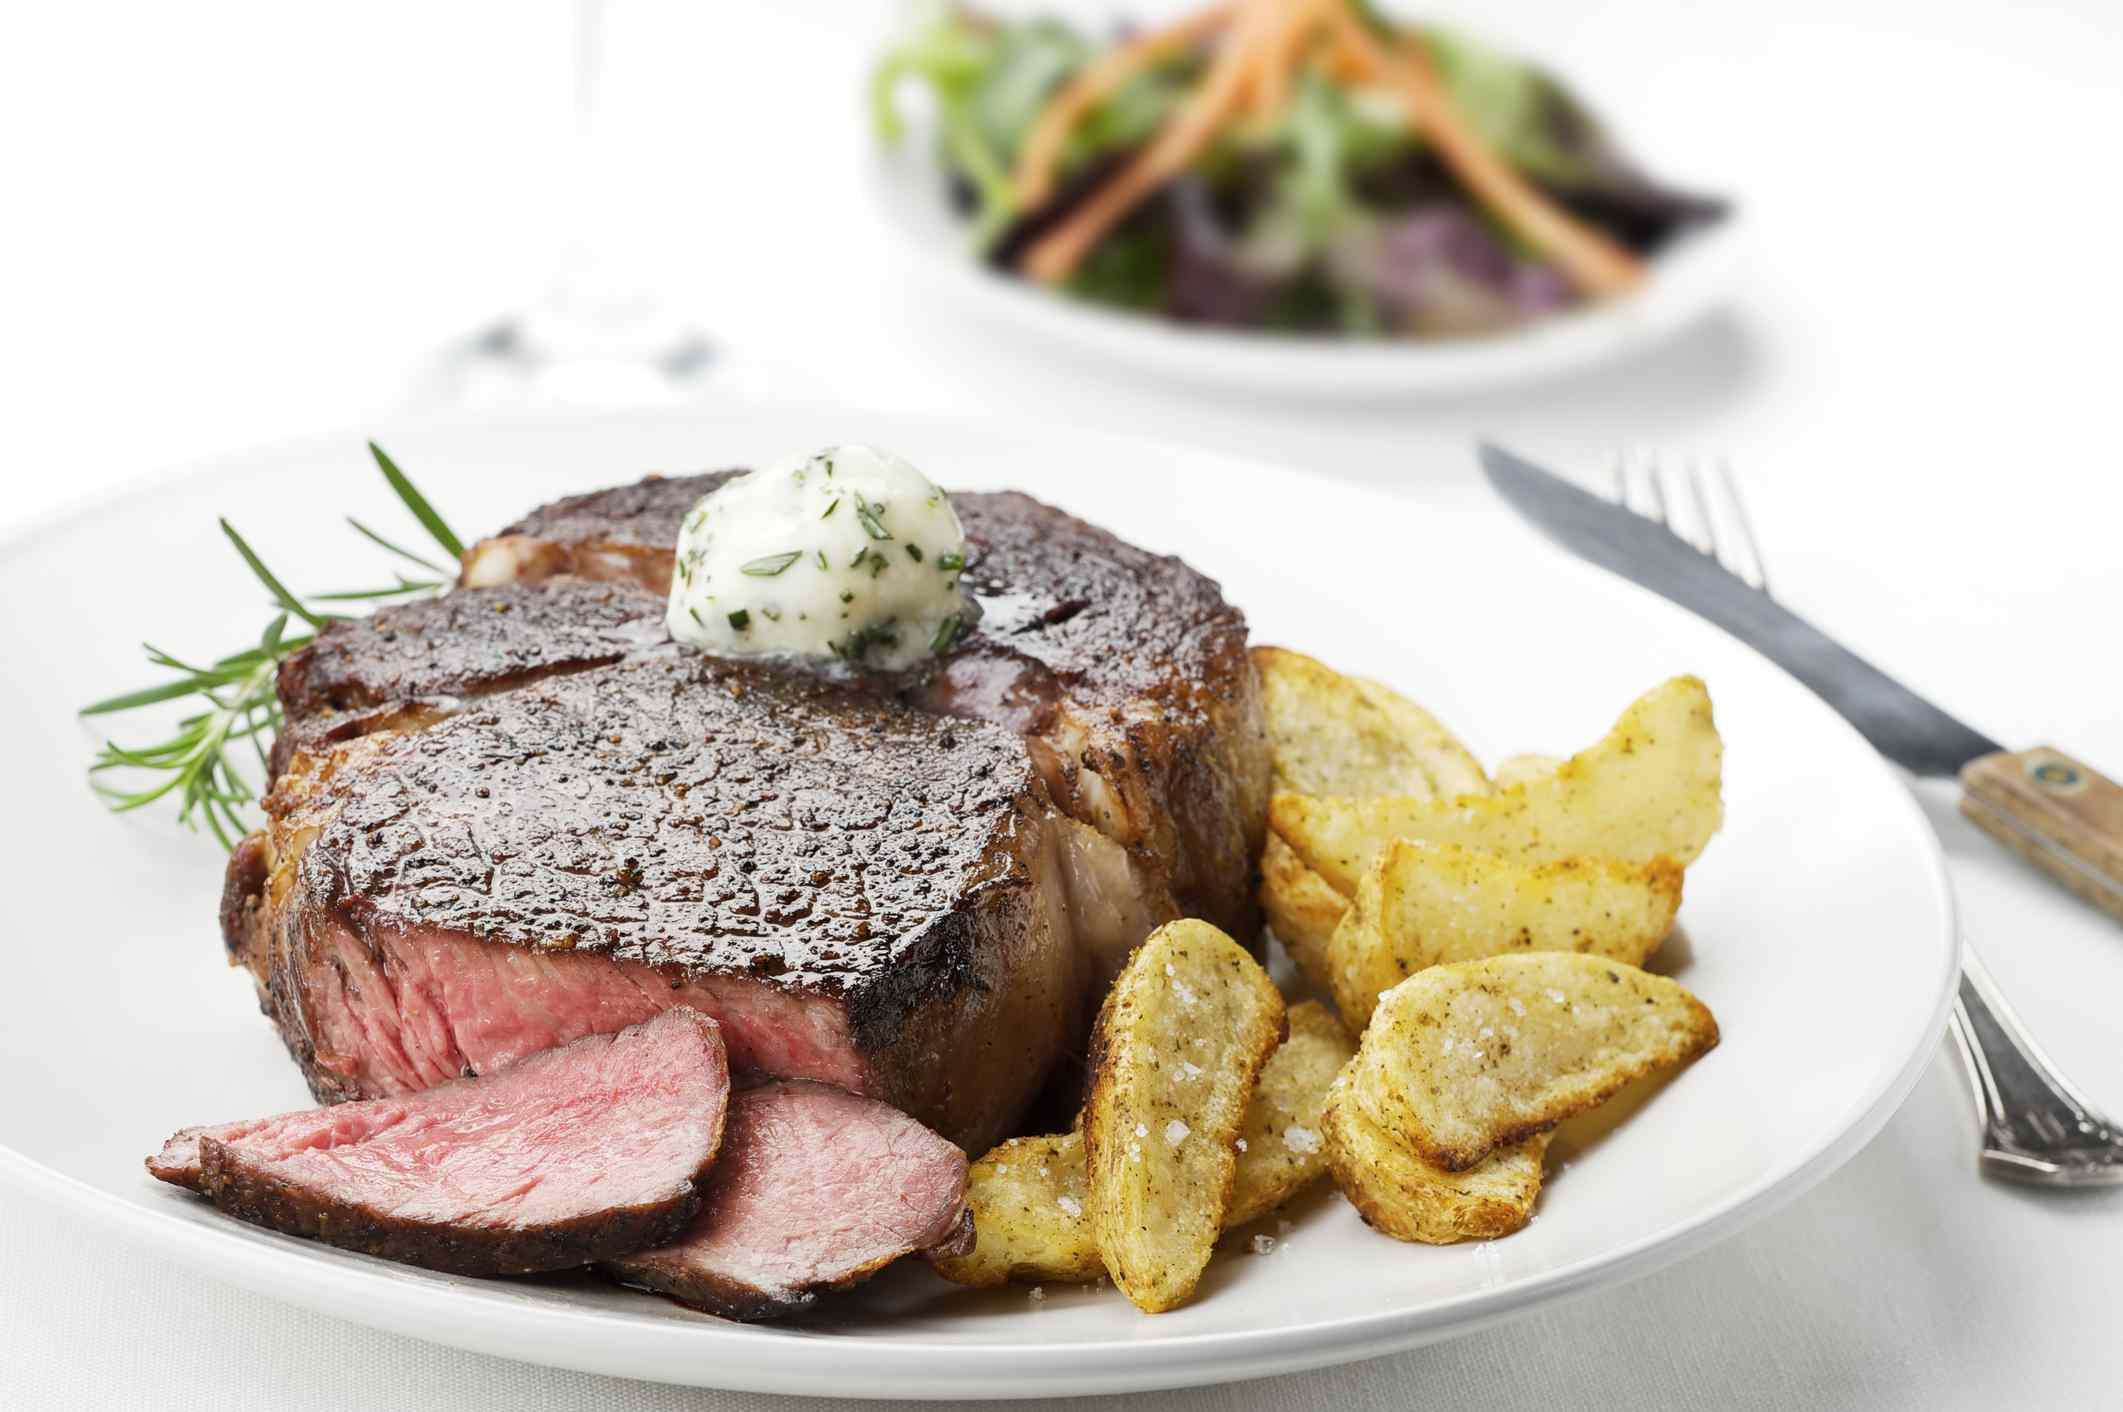 Steak and potato dinner